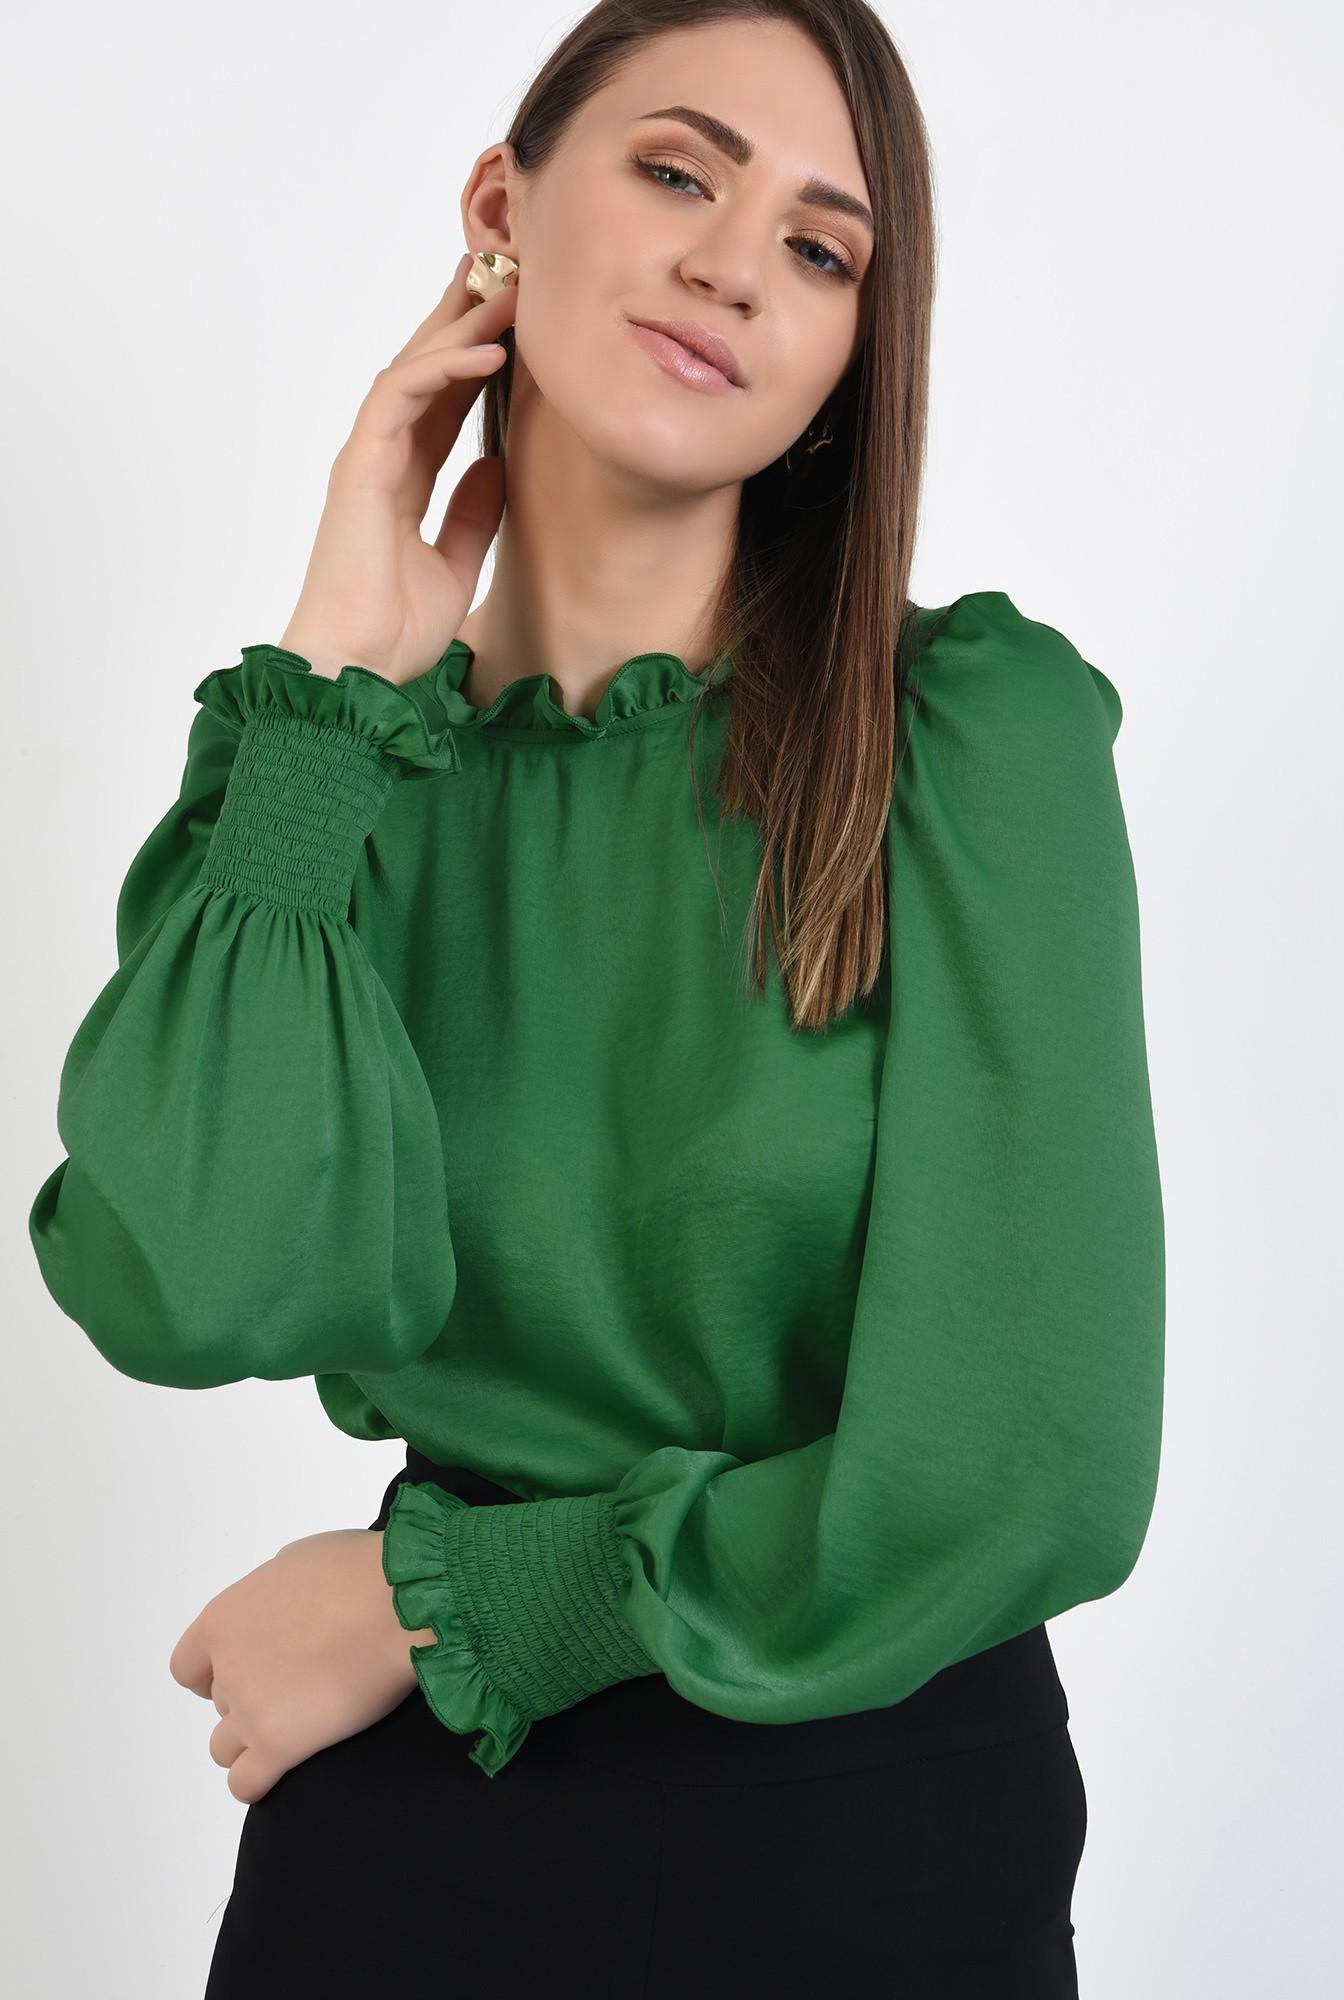 2 - bluza verde, din satin, guler incretit, maneci lungi, butoniera